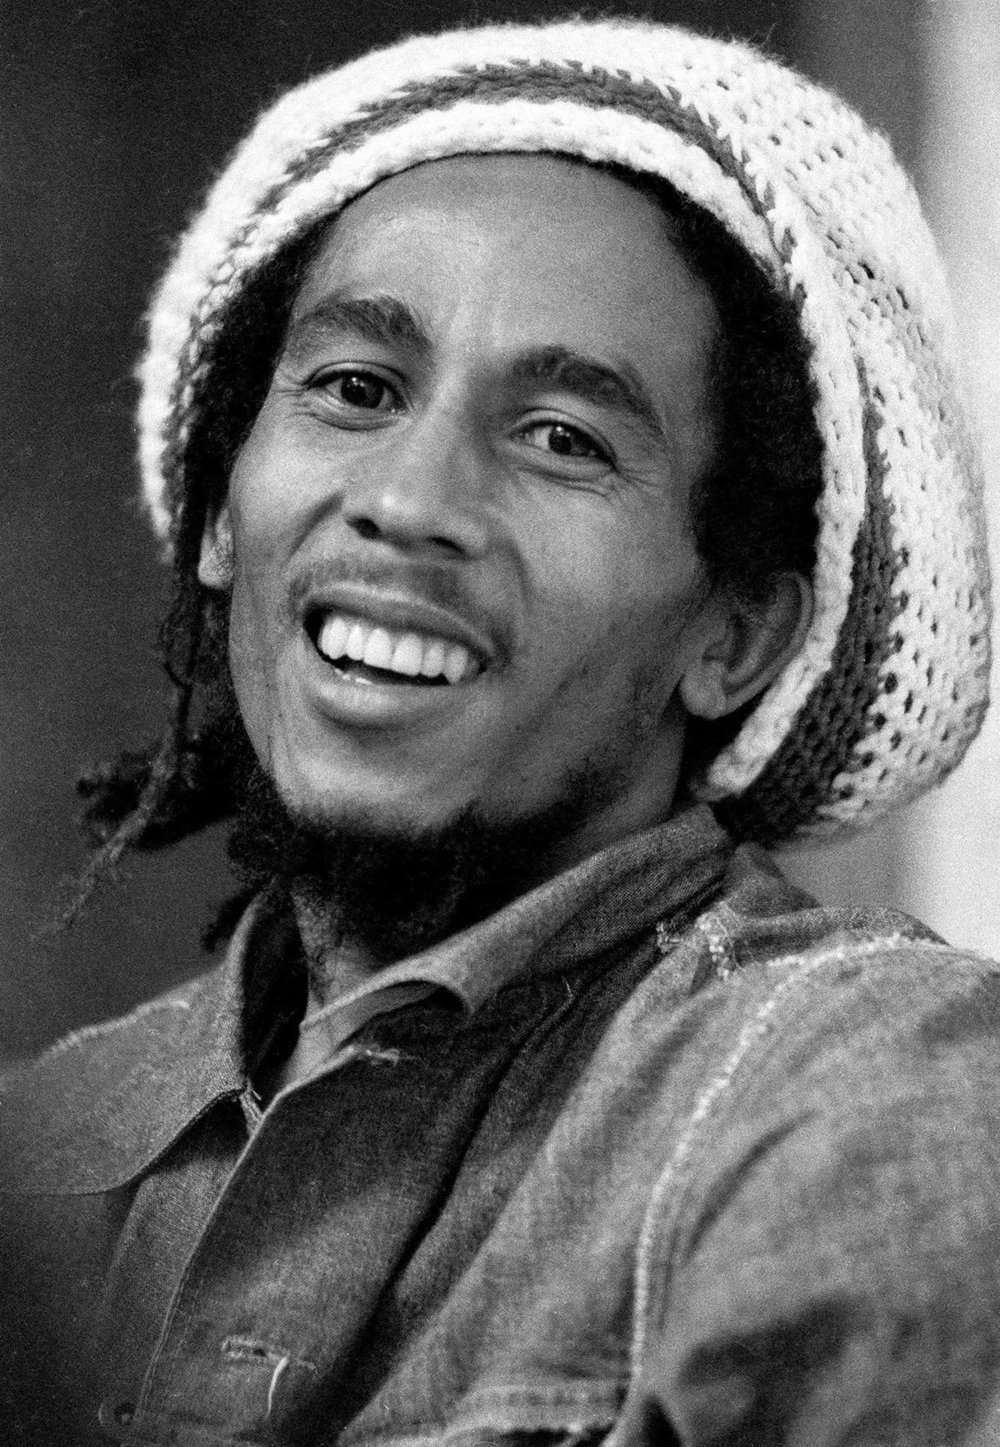 Bob Marley, London, 1975